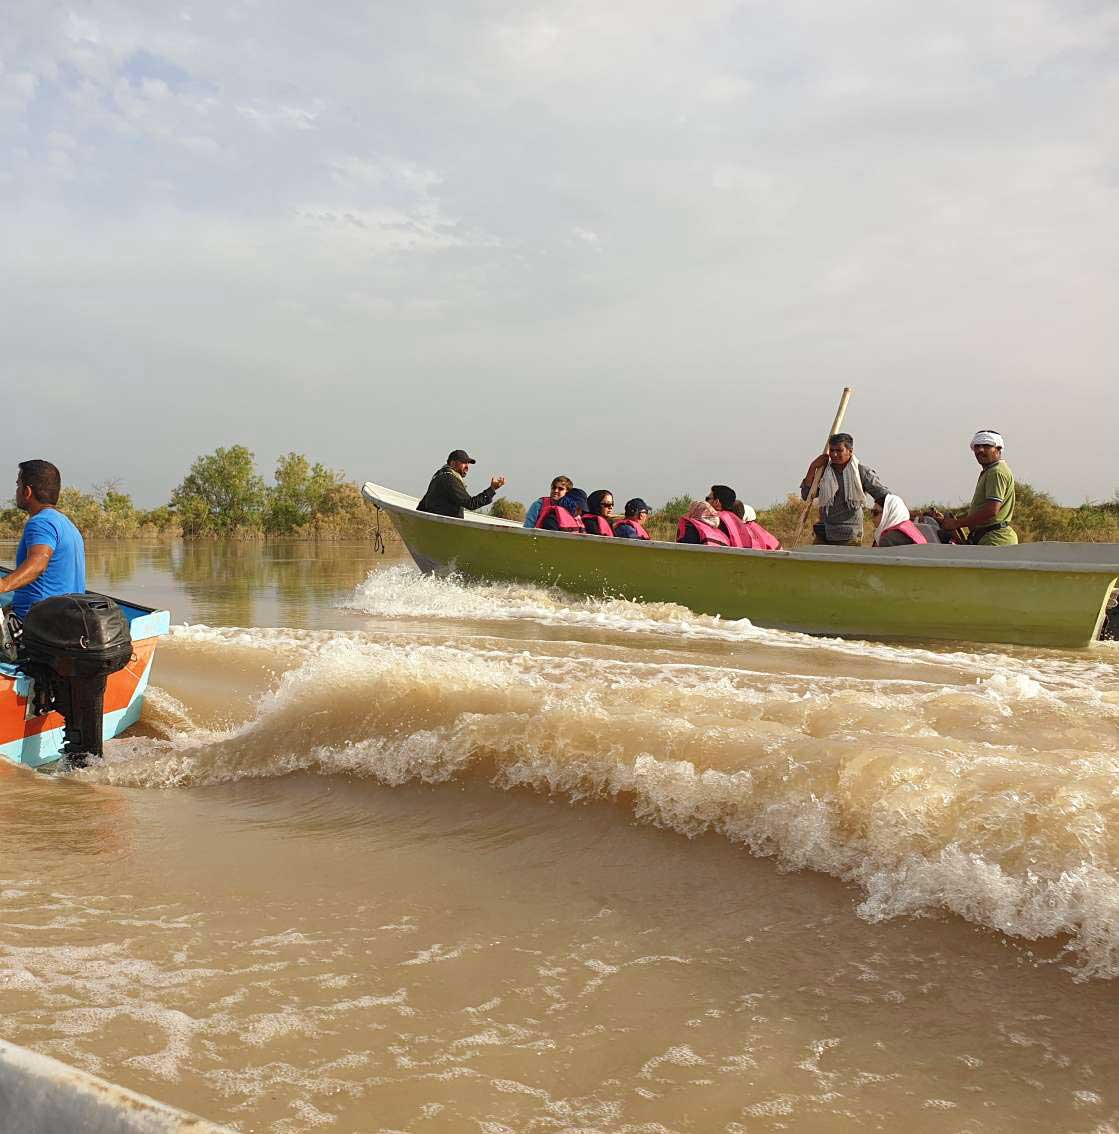 iran-floods-2019-story-timeline-10.jpg